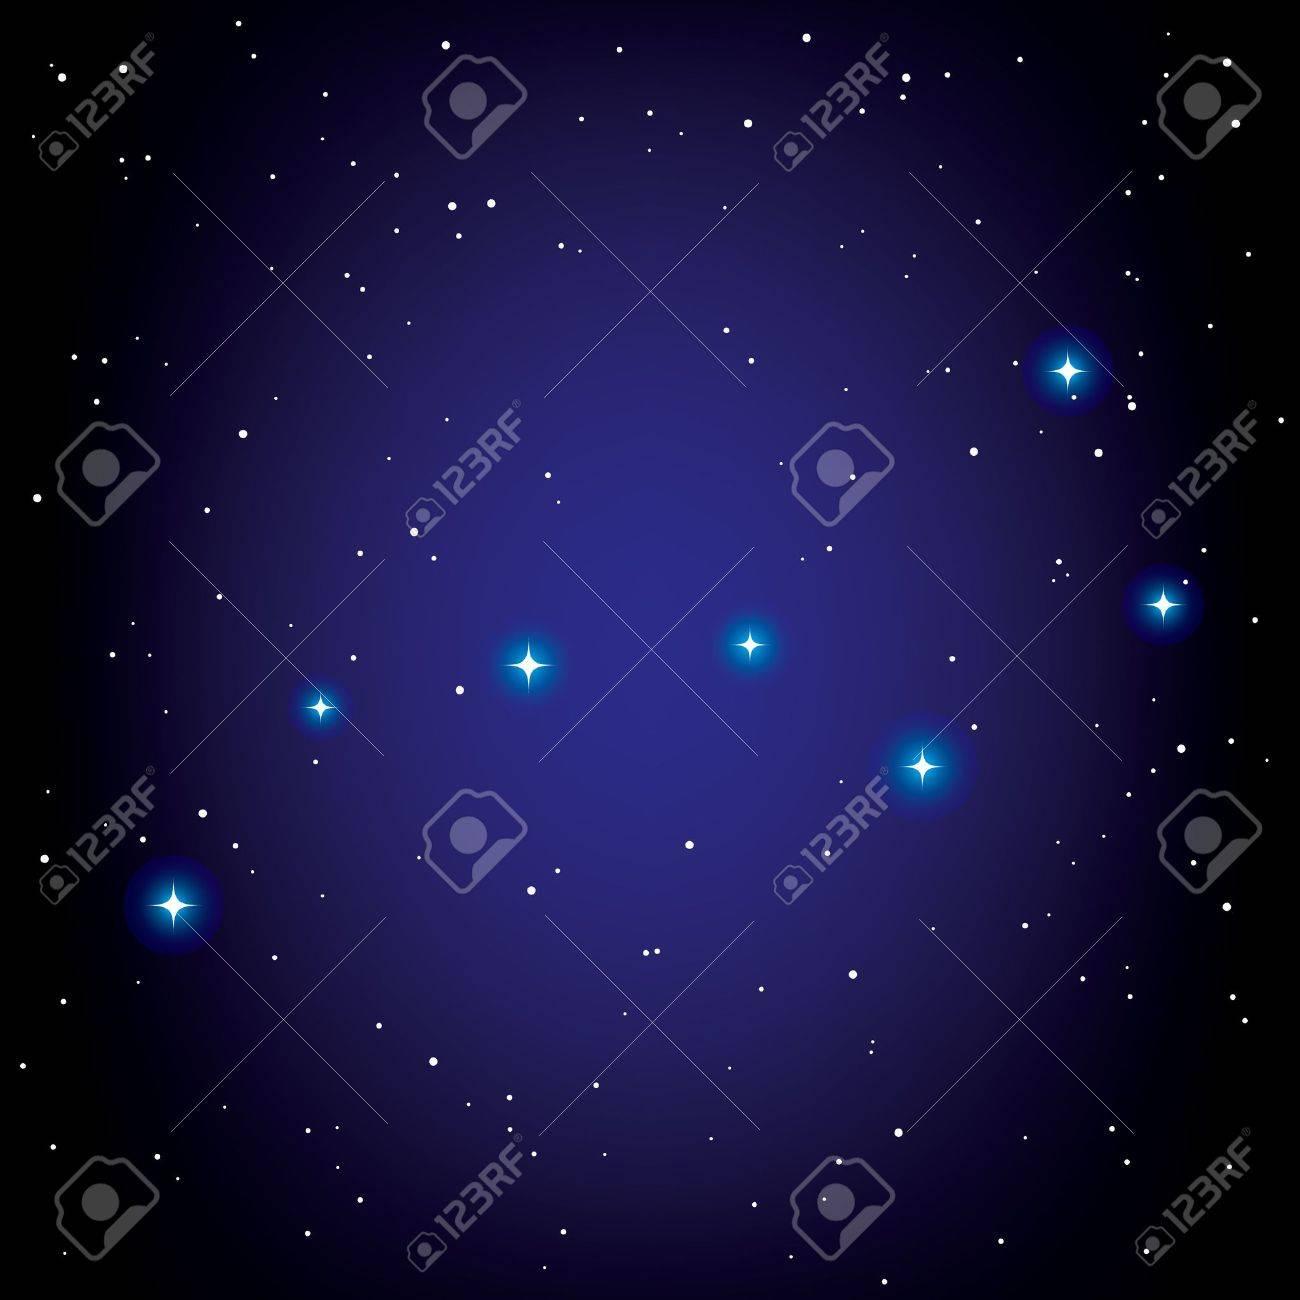 constellation of Big Dipper. Stock Vector - 11811587